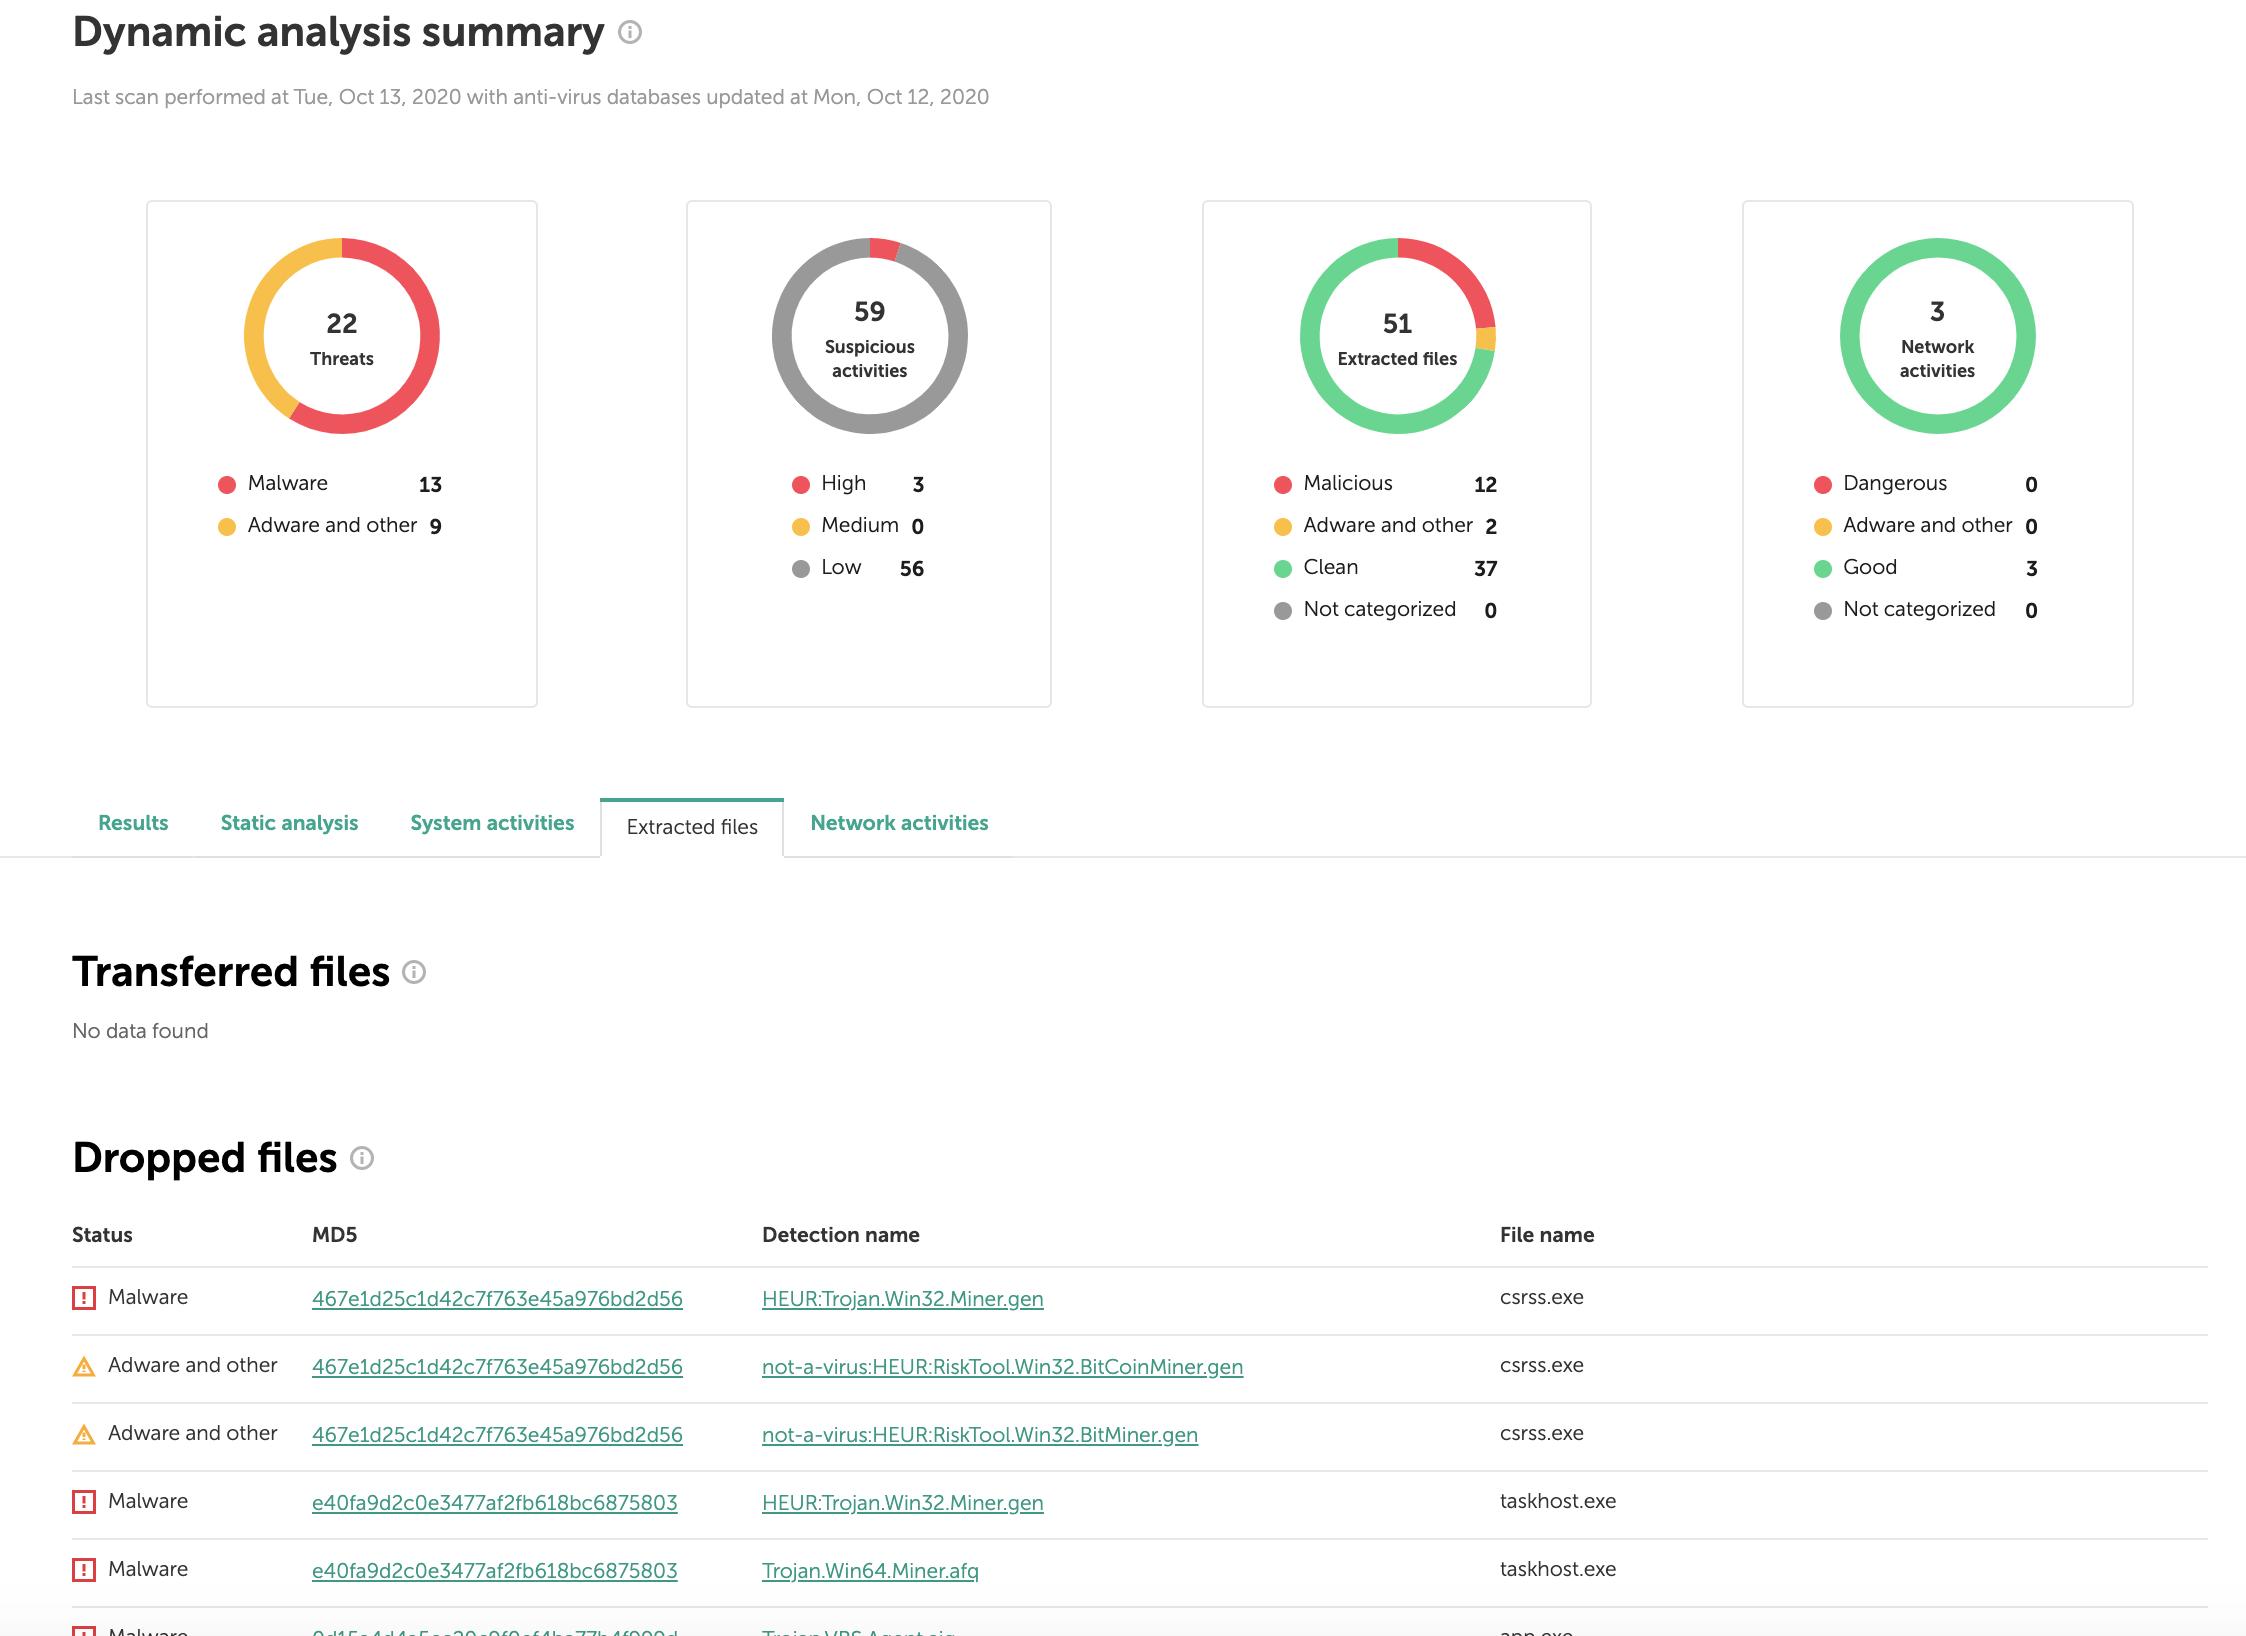 Kaspersky OpenTIP: sintesi dell'analisi dinamica